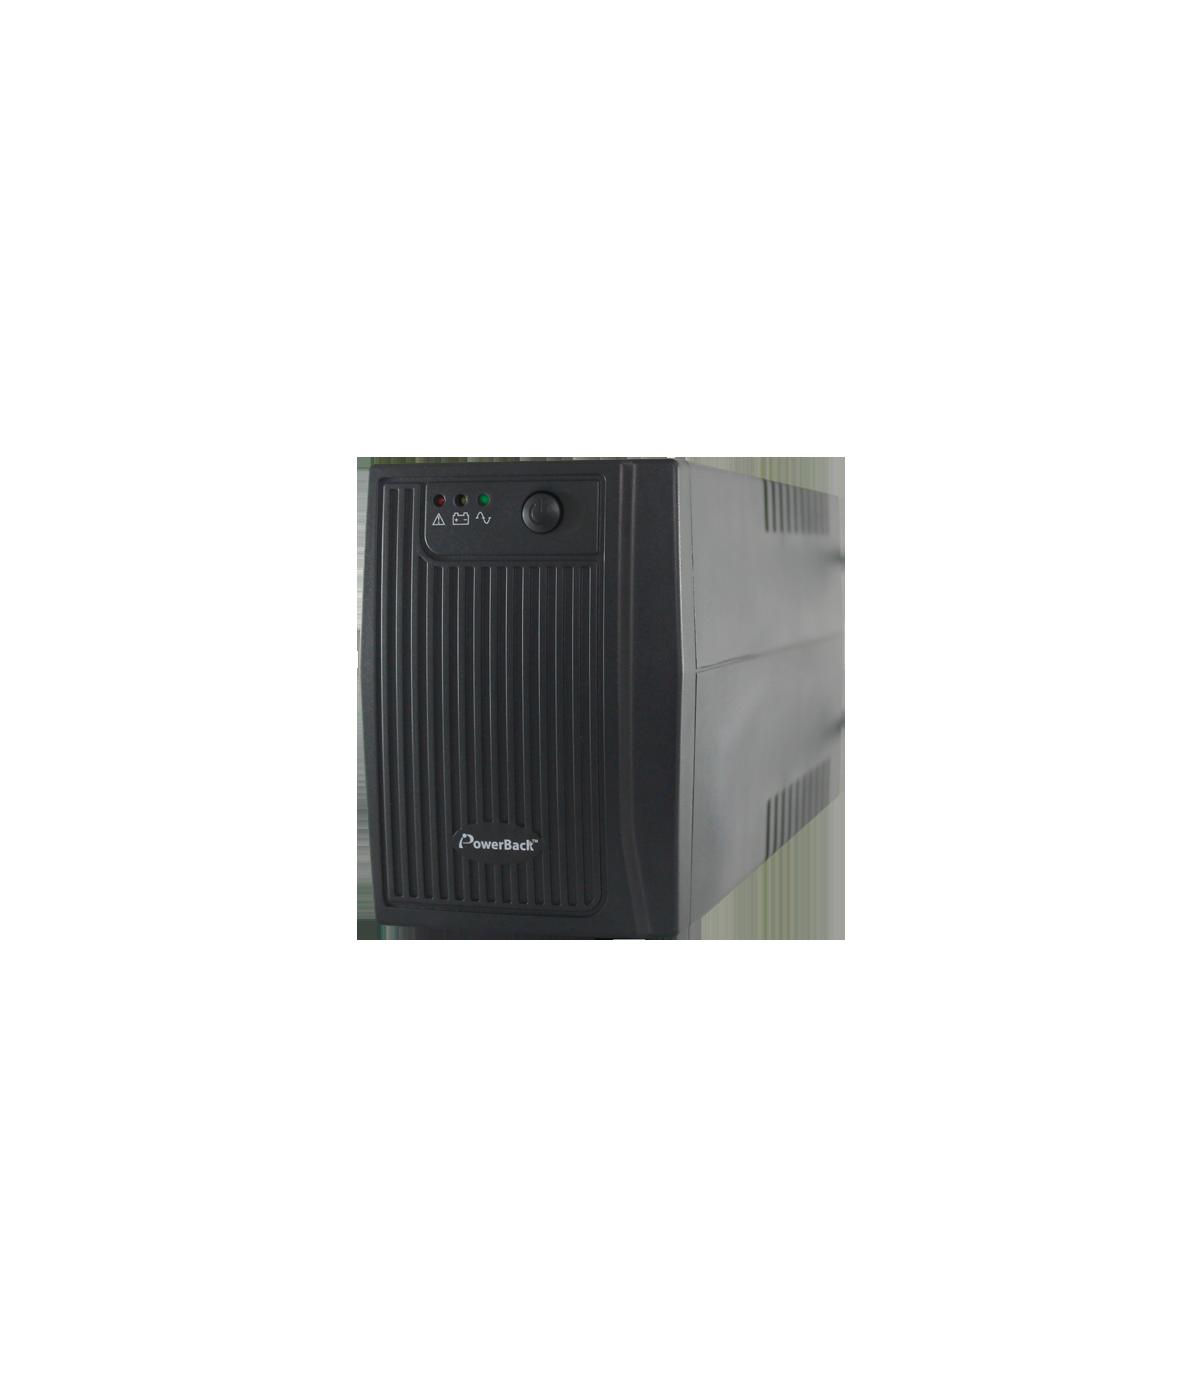 UPS POWERBACK 600VA NEWLINE INTERACTIVA